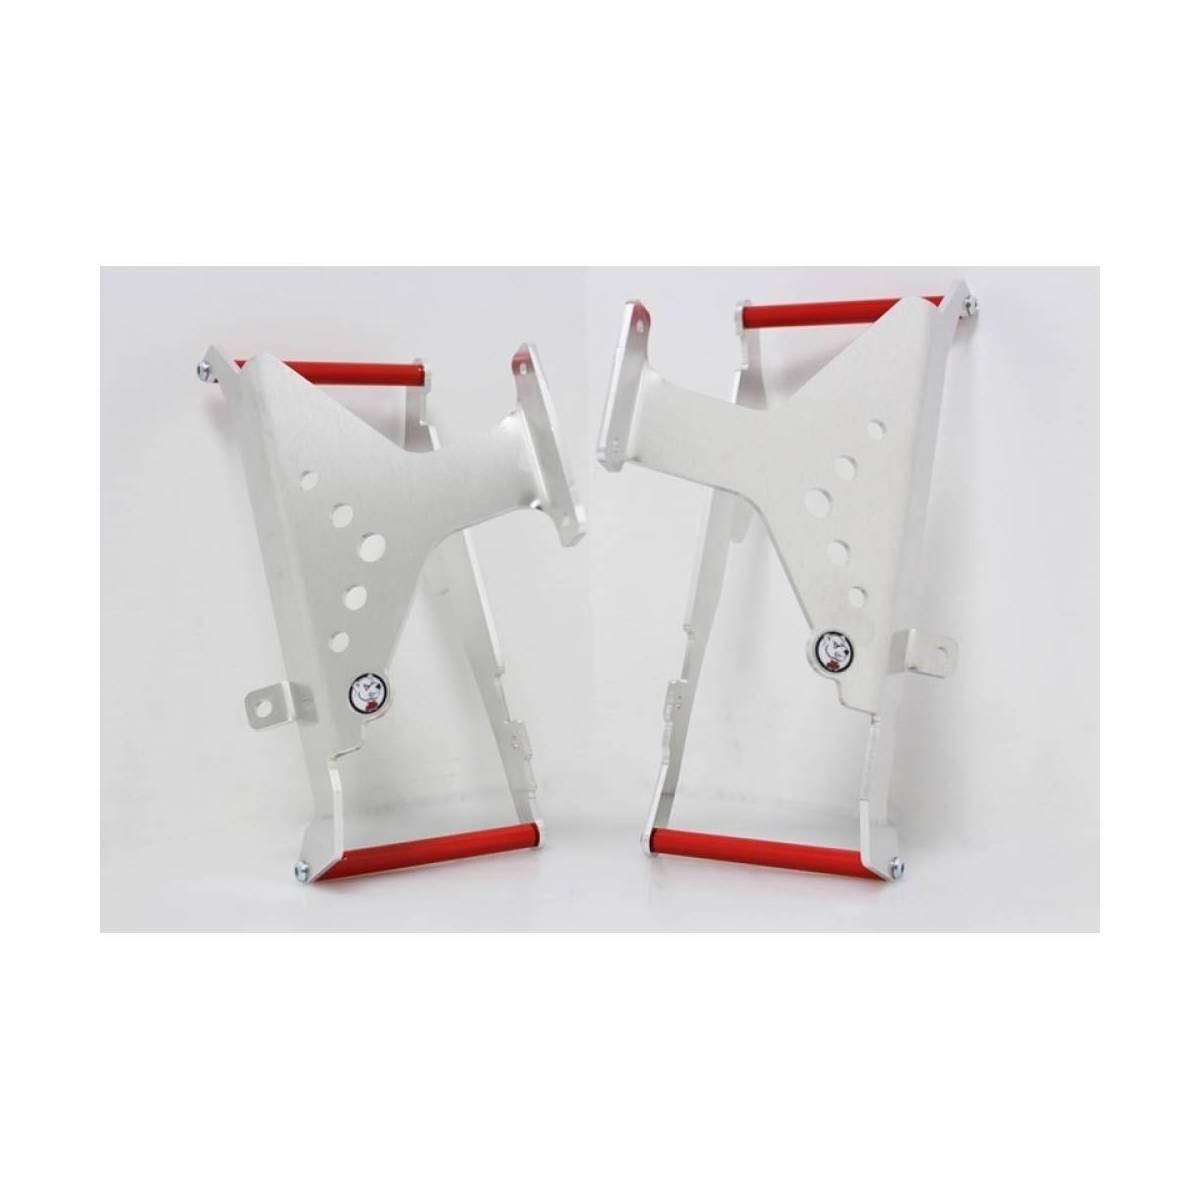 AX1257 - Protectores De Radiador Aluminio Rojo Axp Honda